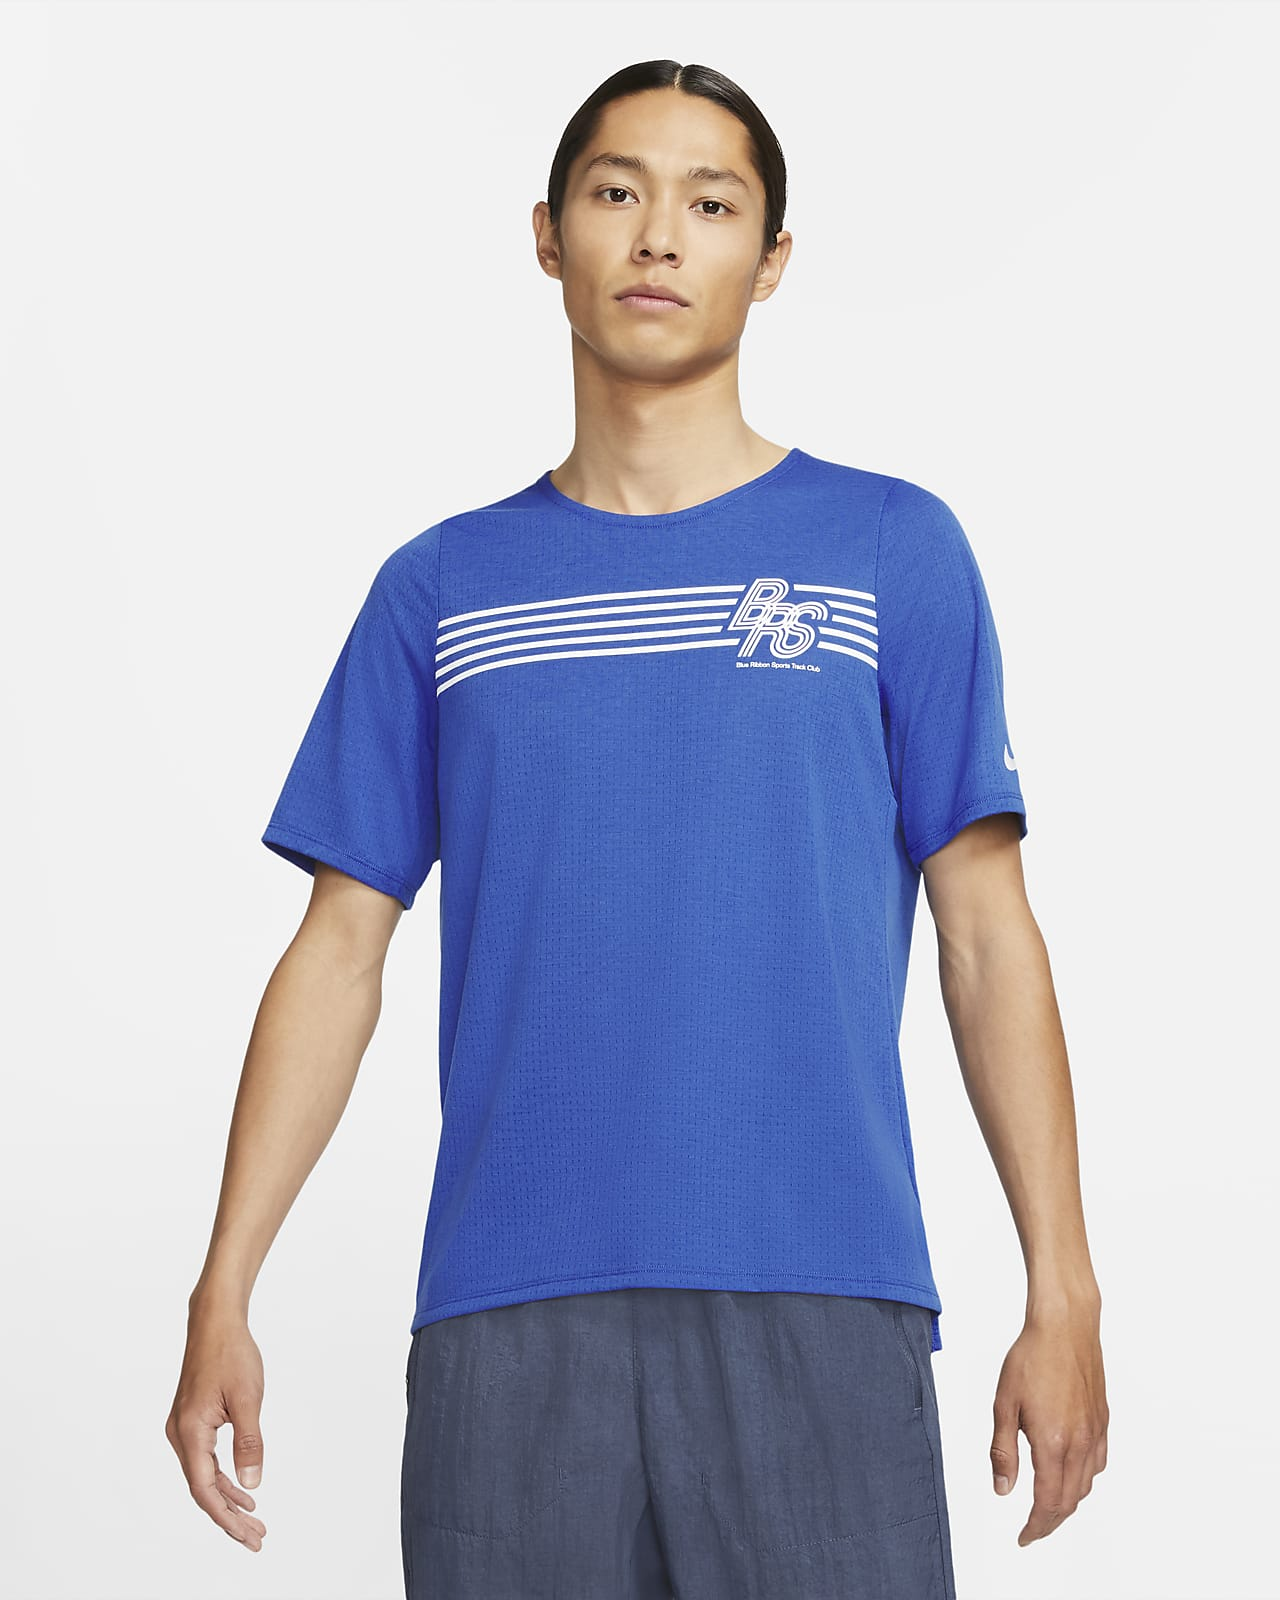 Nike Rise 365 BRS 男款短袖跑步上衣